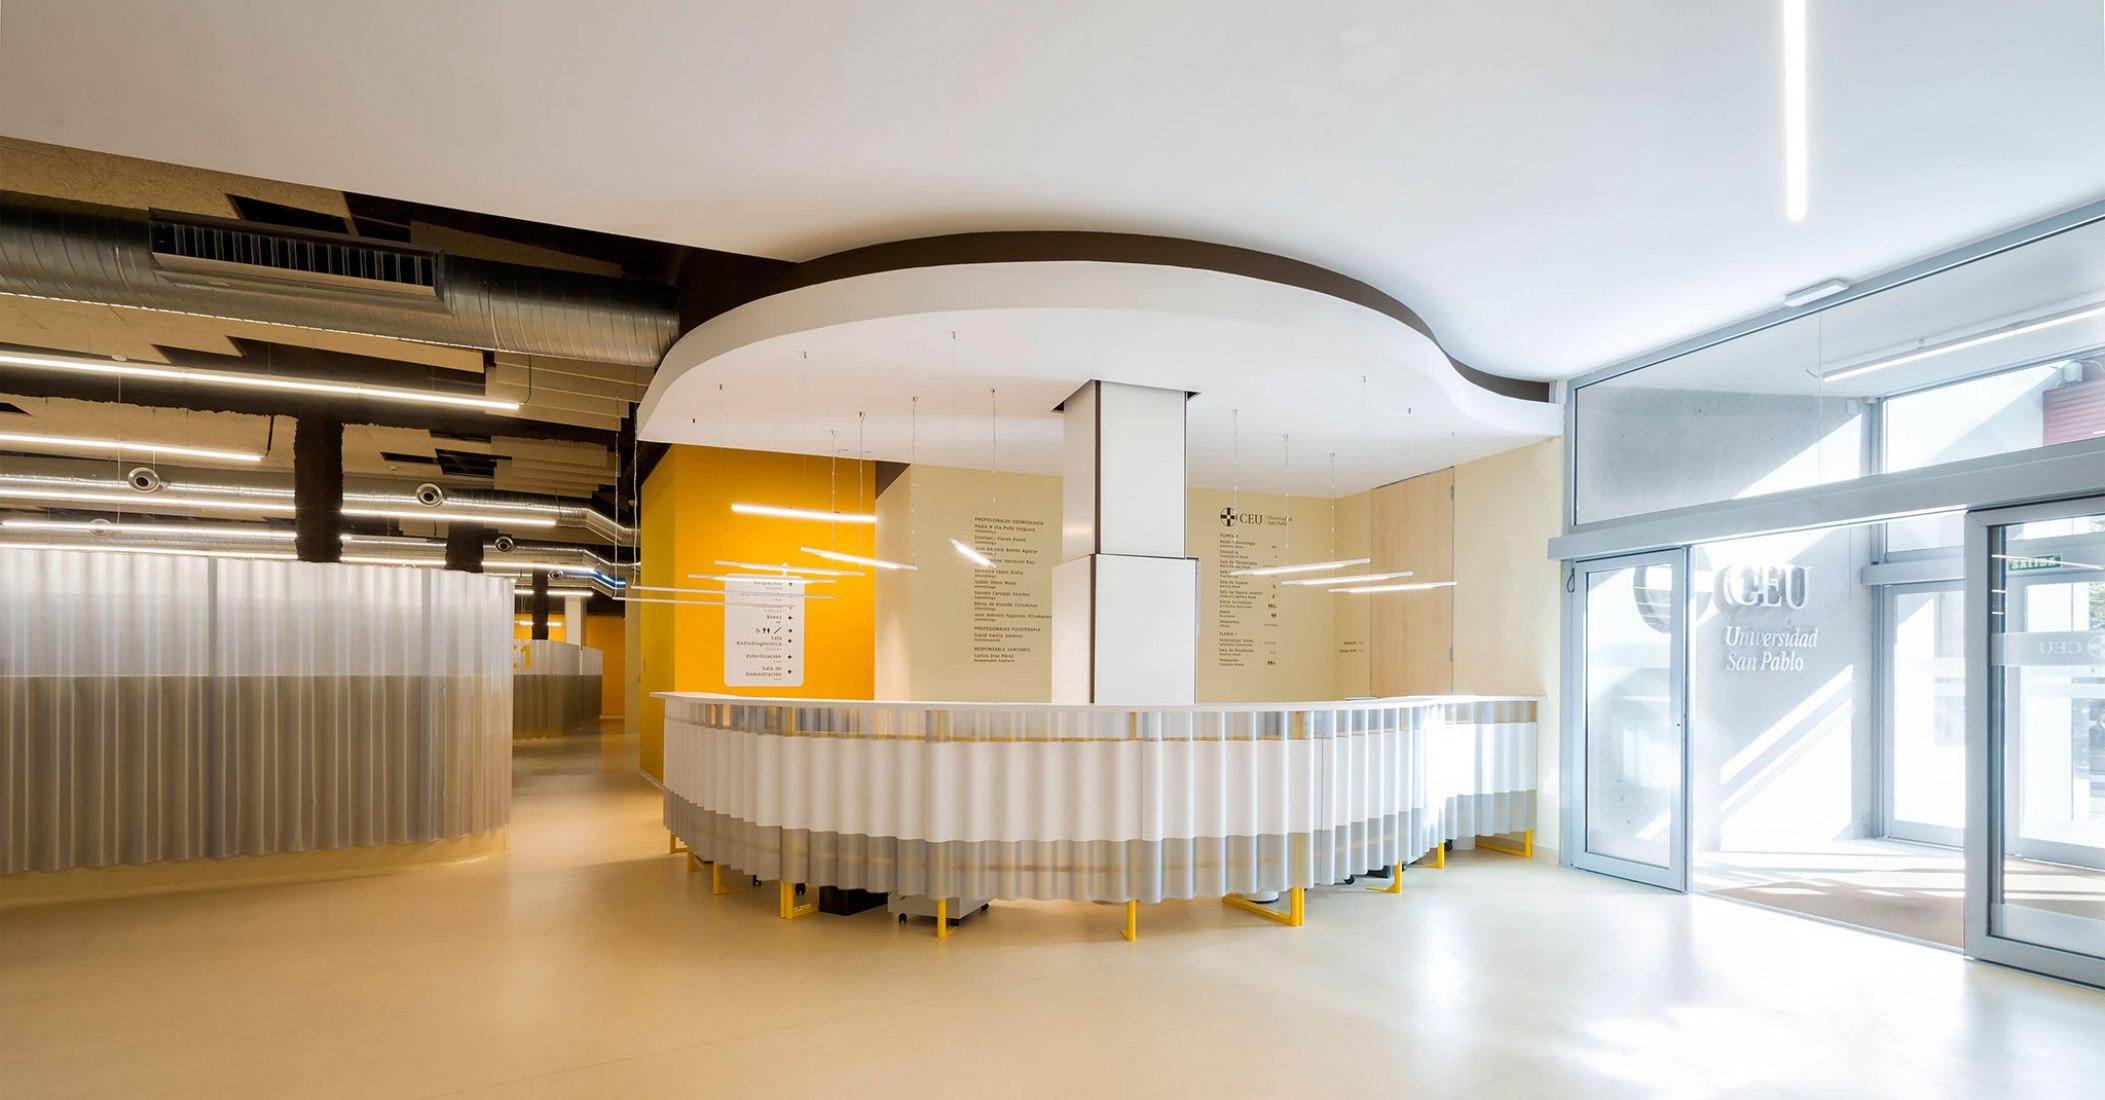 University Polyclinic of the University CEU San Pablo by Adam Bresnick architects. Photograph by Antonio Romeo.